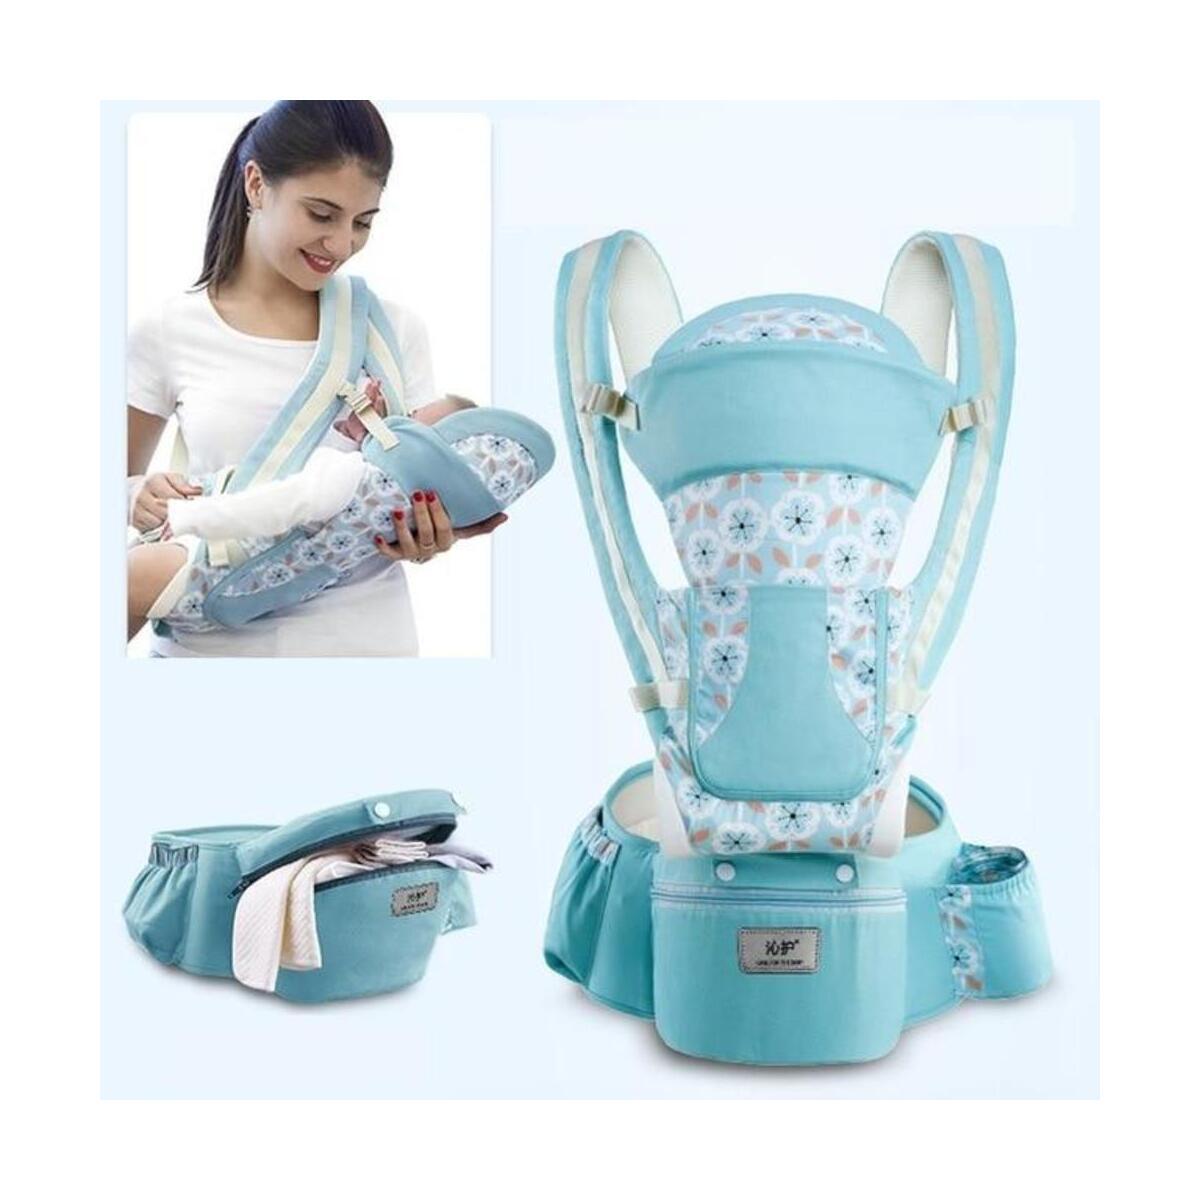 High Tech Baby Carrier W/ Hip seat